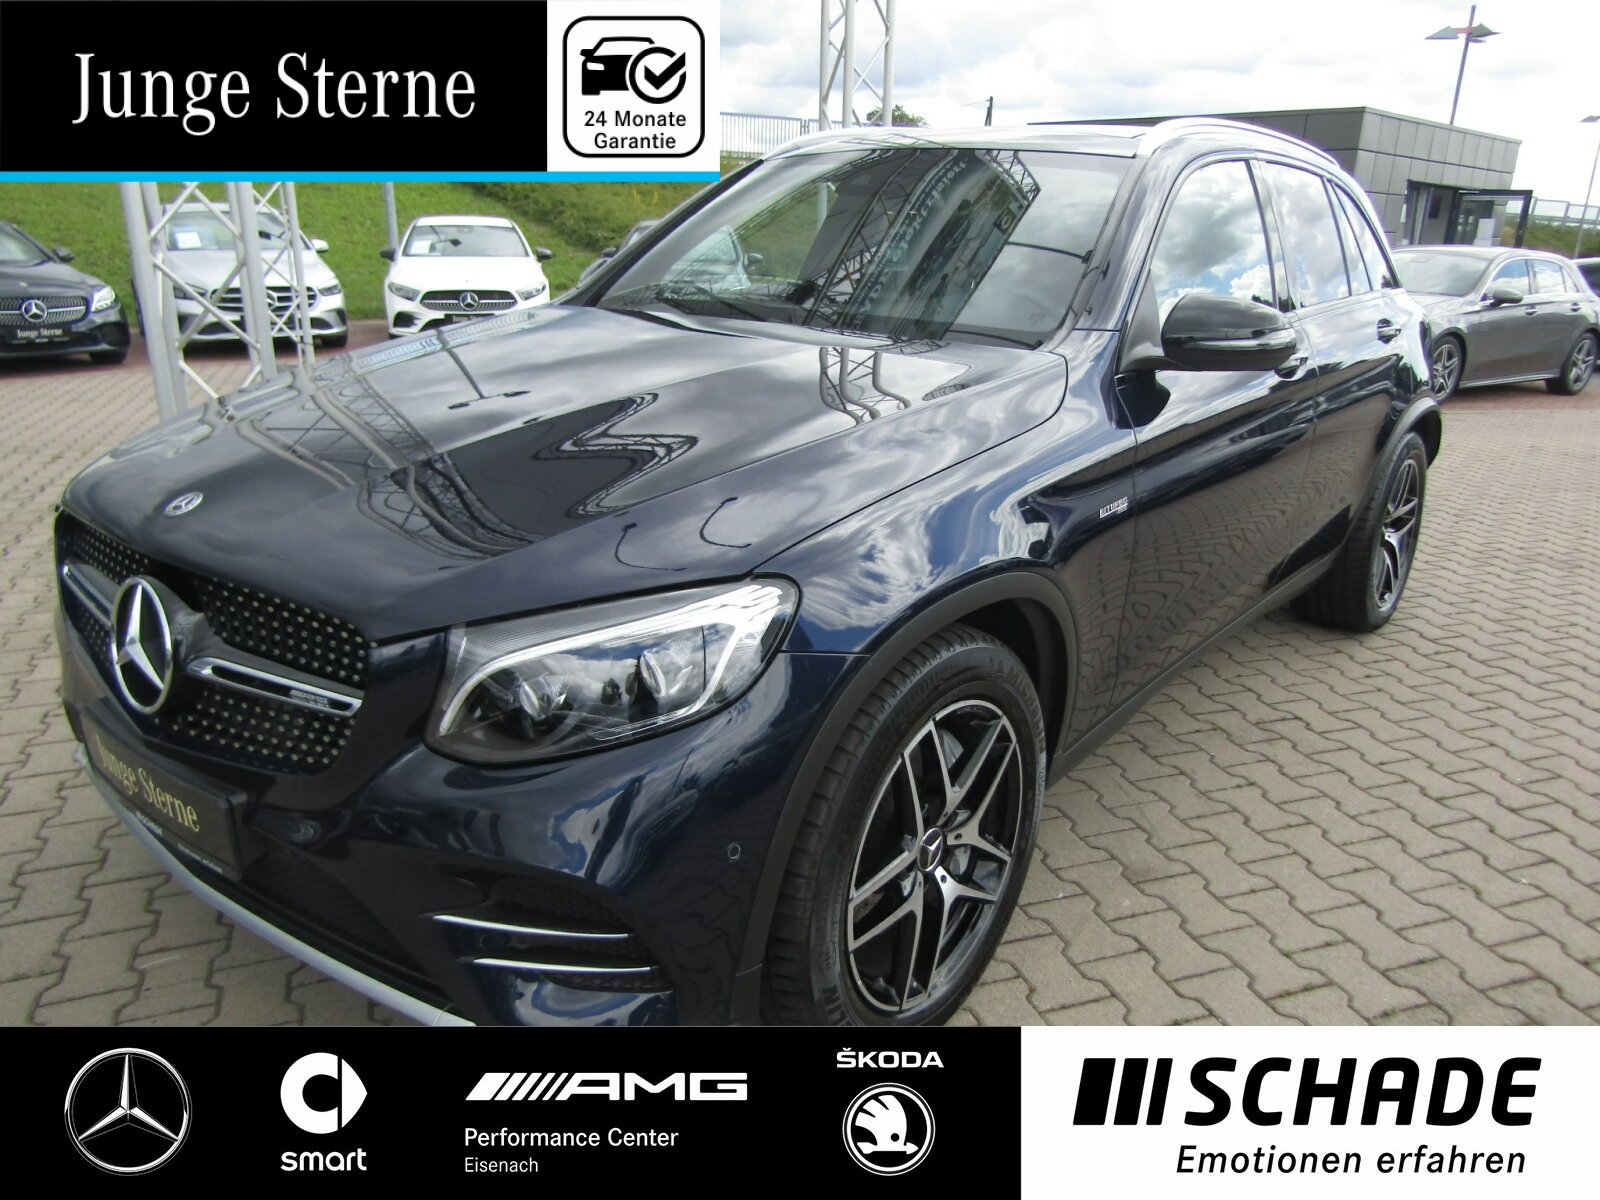 Mercedes-Benz GLC 43 4M AMG *Panorama*AHK*LED*Airmatic*Kamera*, Jahr 2017, Benzin